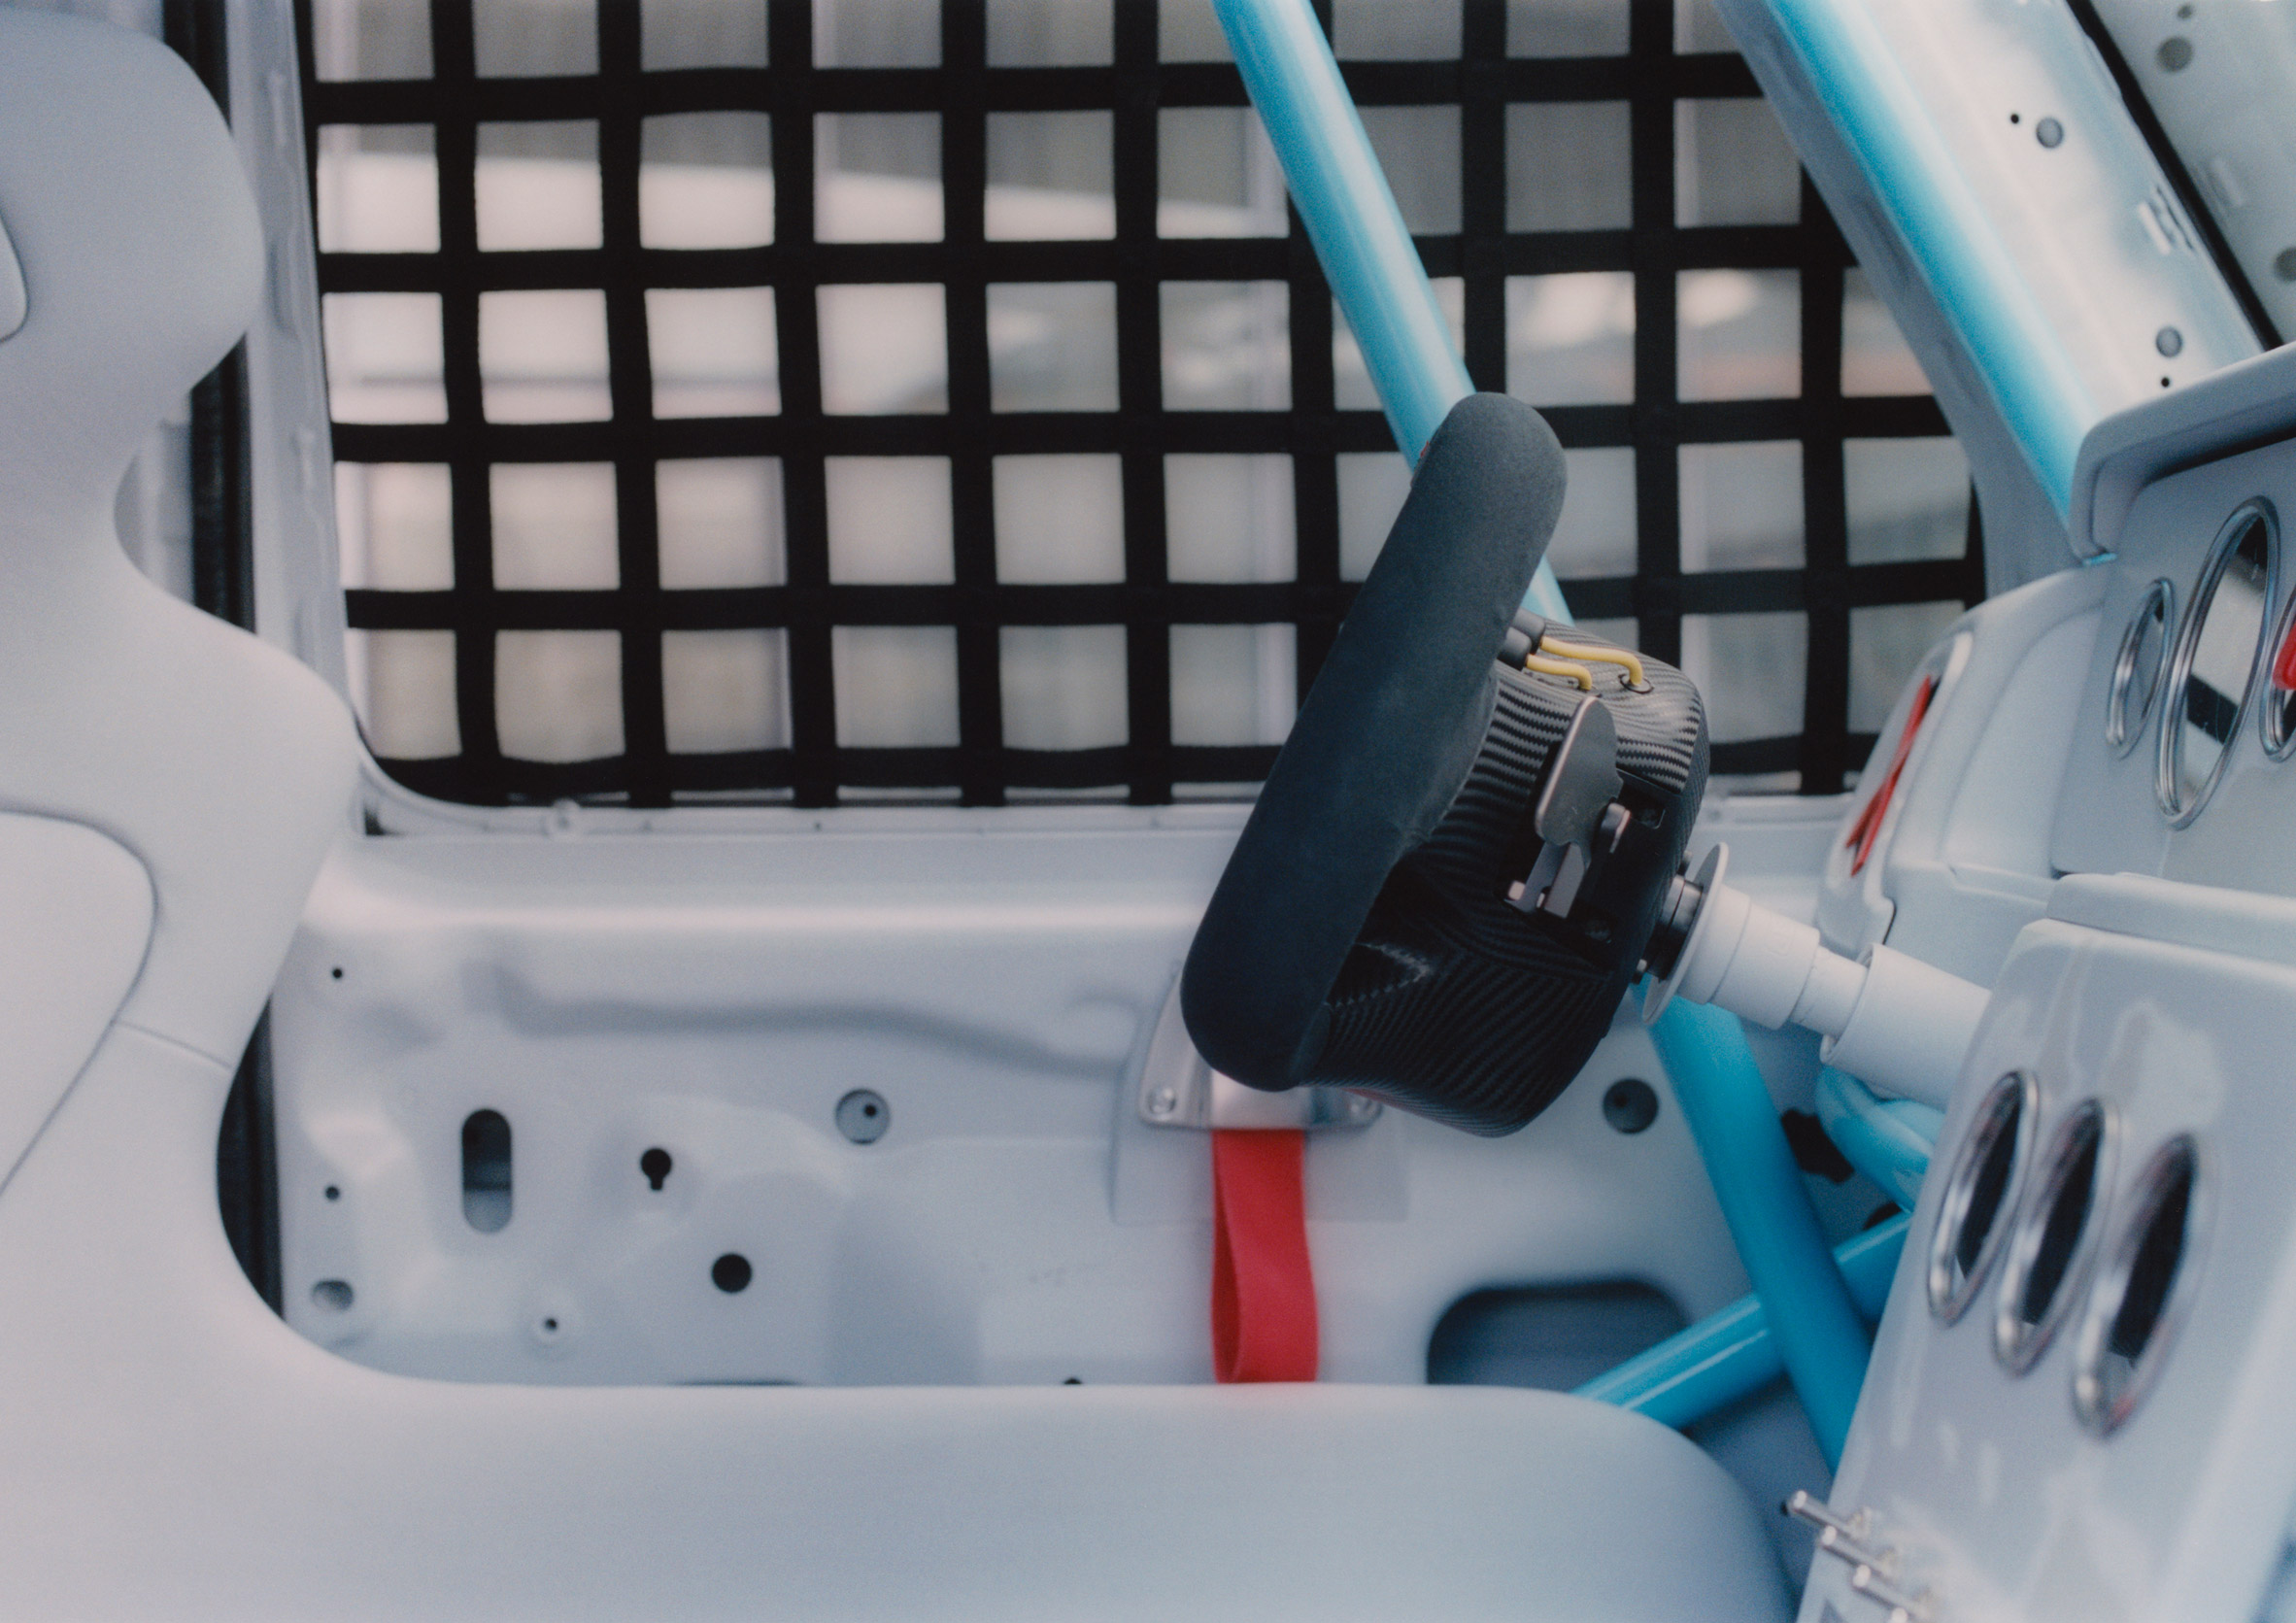 Interior view of Project Geländewagen car by Virgil Abloh and Mercedes Benz